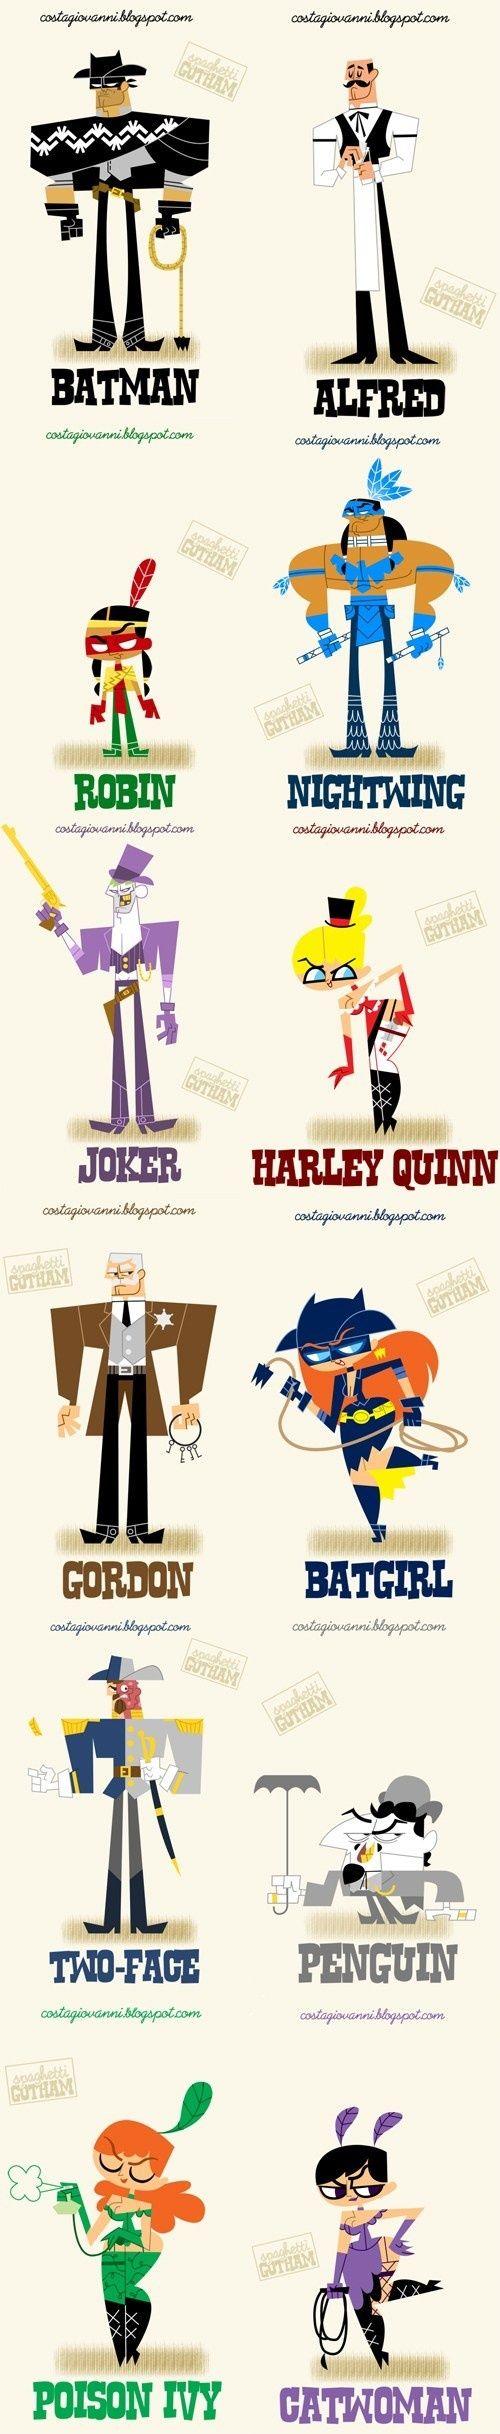 "Batman As Spaghetti Western - Funky Superhero Art - FUNK GUMBO RADIO: http://www.live365.com/stations/sirhobson and ""Like"" us at: https://www.facebook.com/FUNKGUMBORADIO"